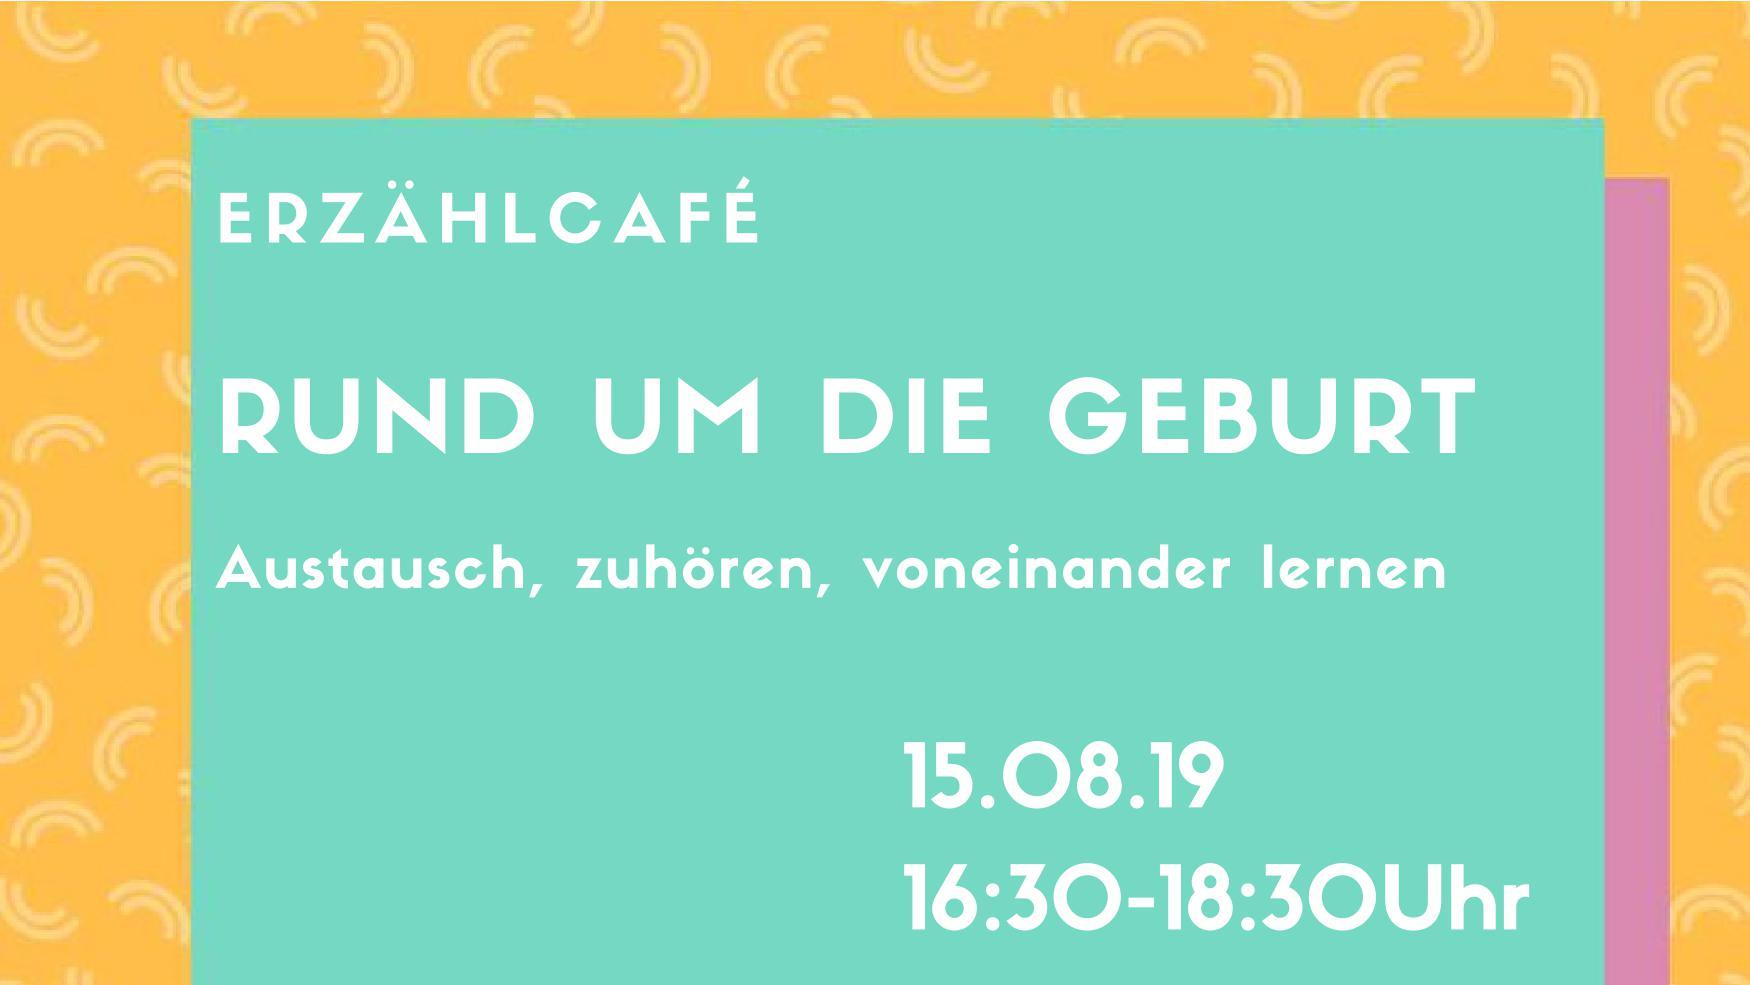 Ankündigung zum ErzÄhlcafé am 15.08.2019